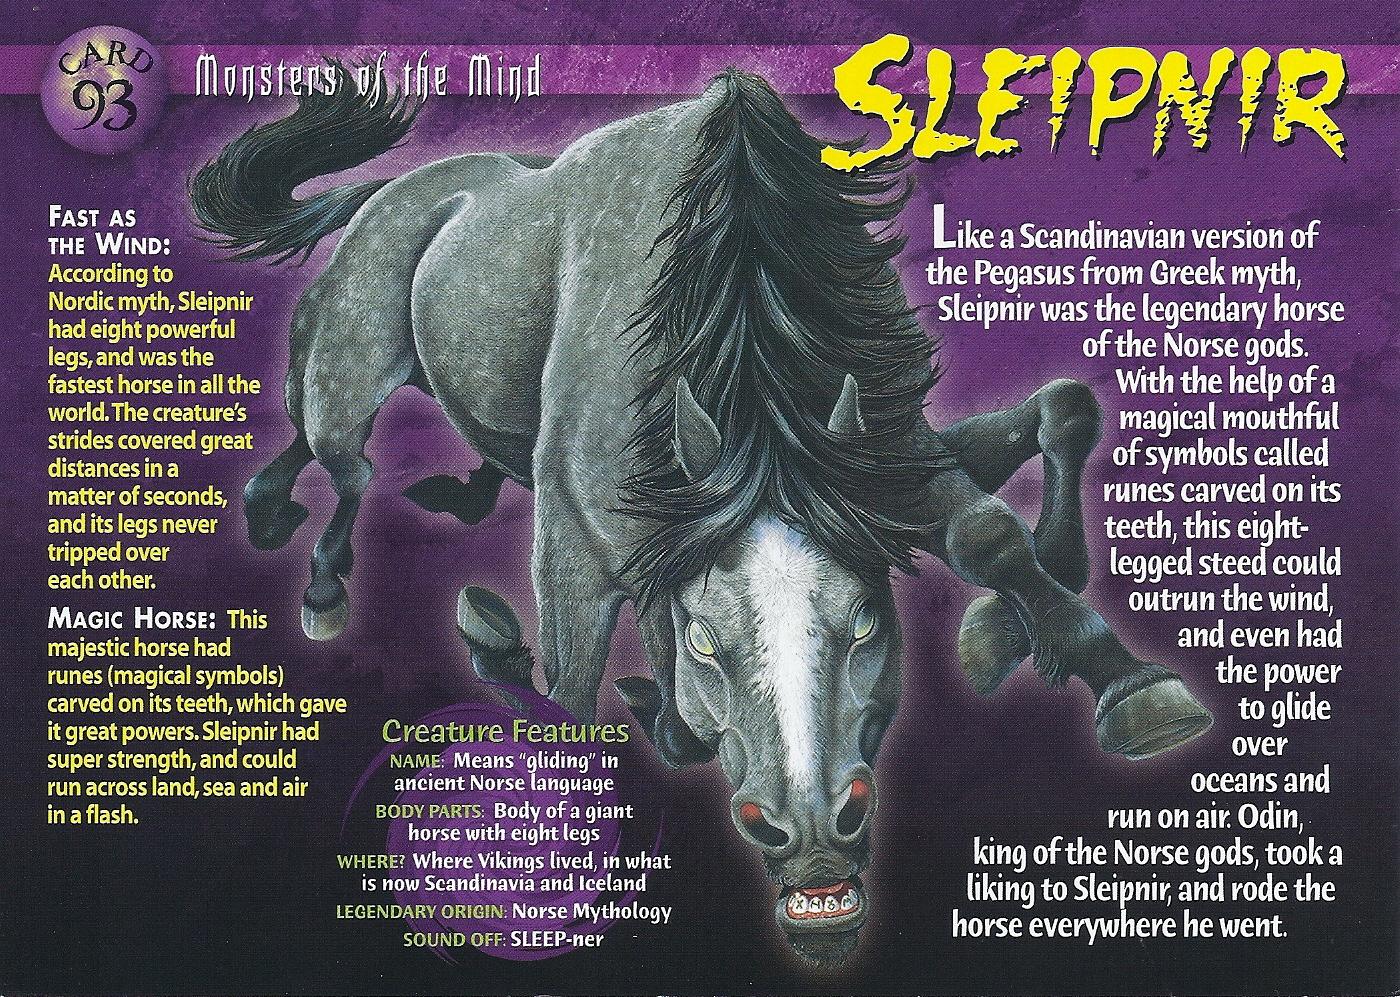 sleipnir wierd n u0027wild creatures wiki fandom powered by wikia